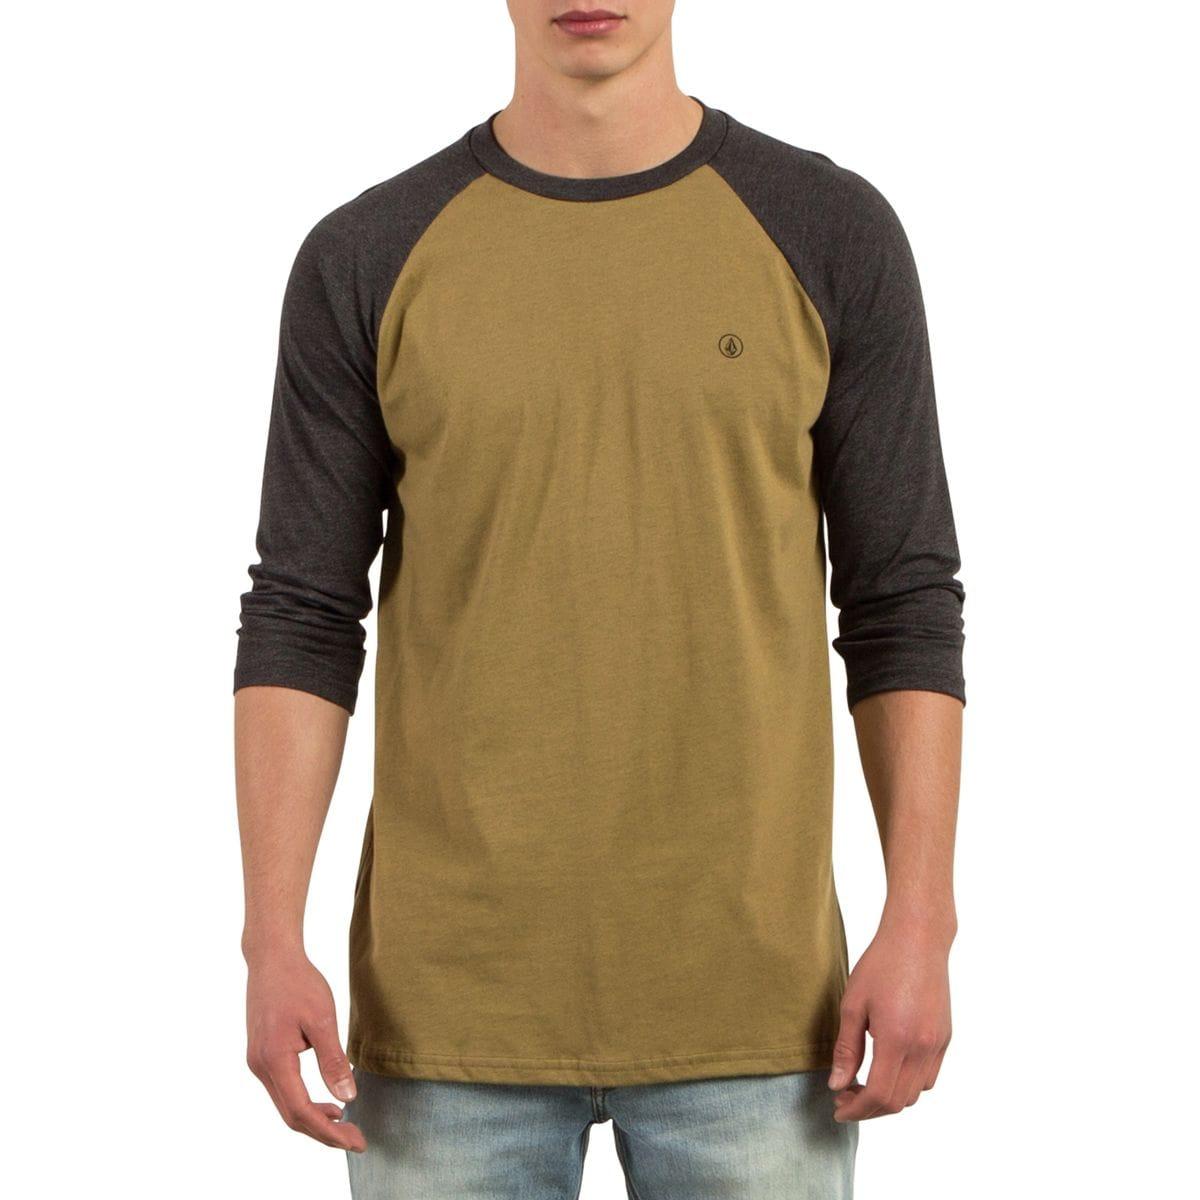 Volcom Solid Heather Raglan T-Shirt - 3/4-Sleeve - Men